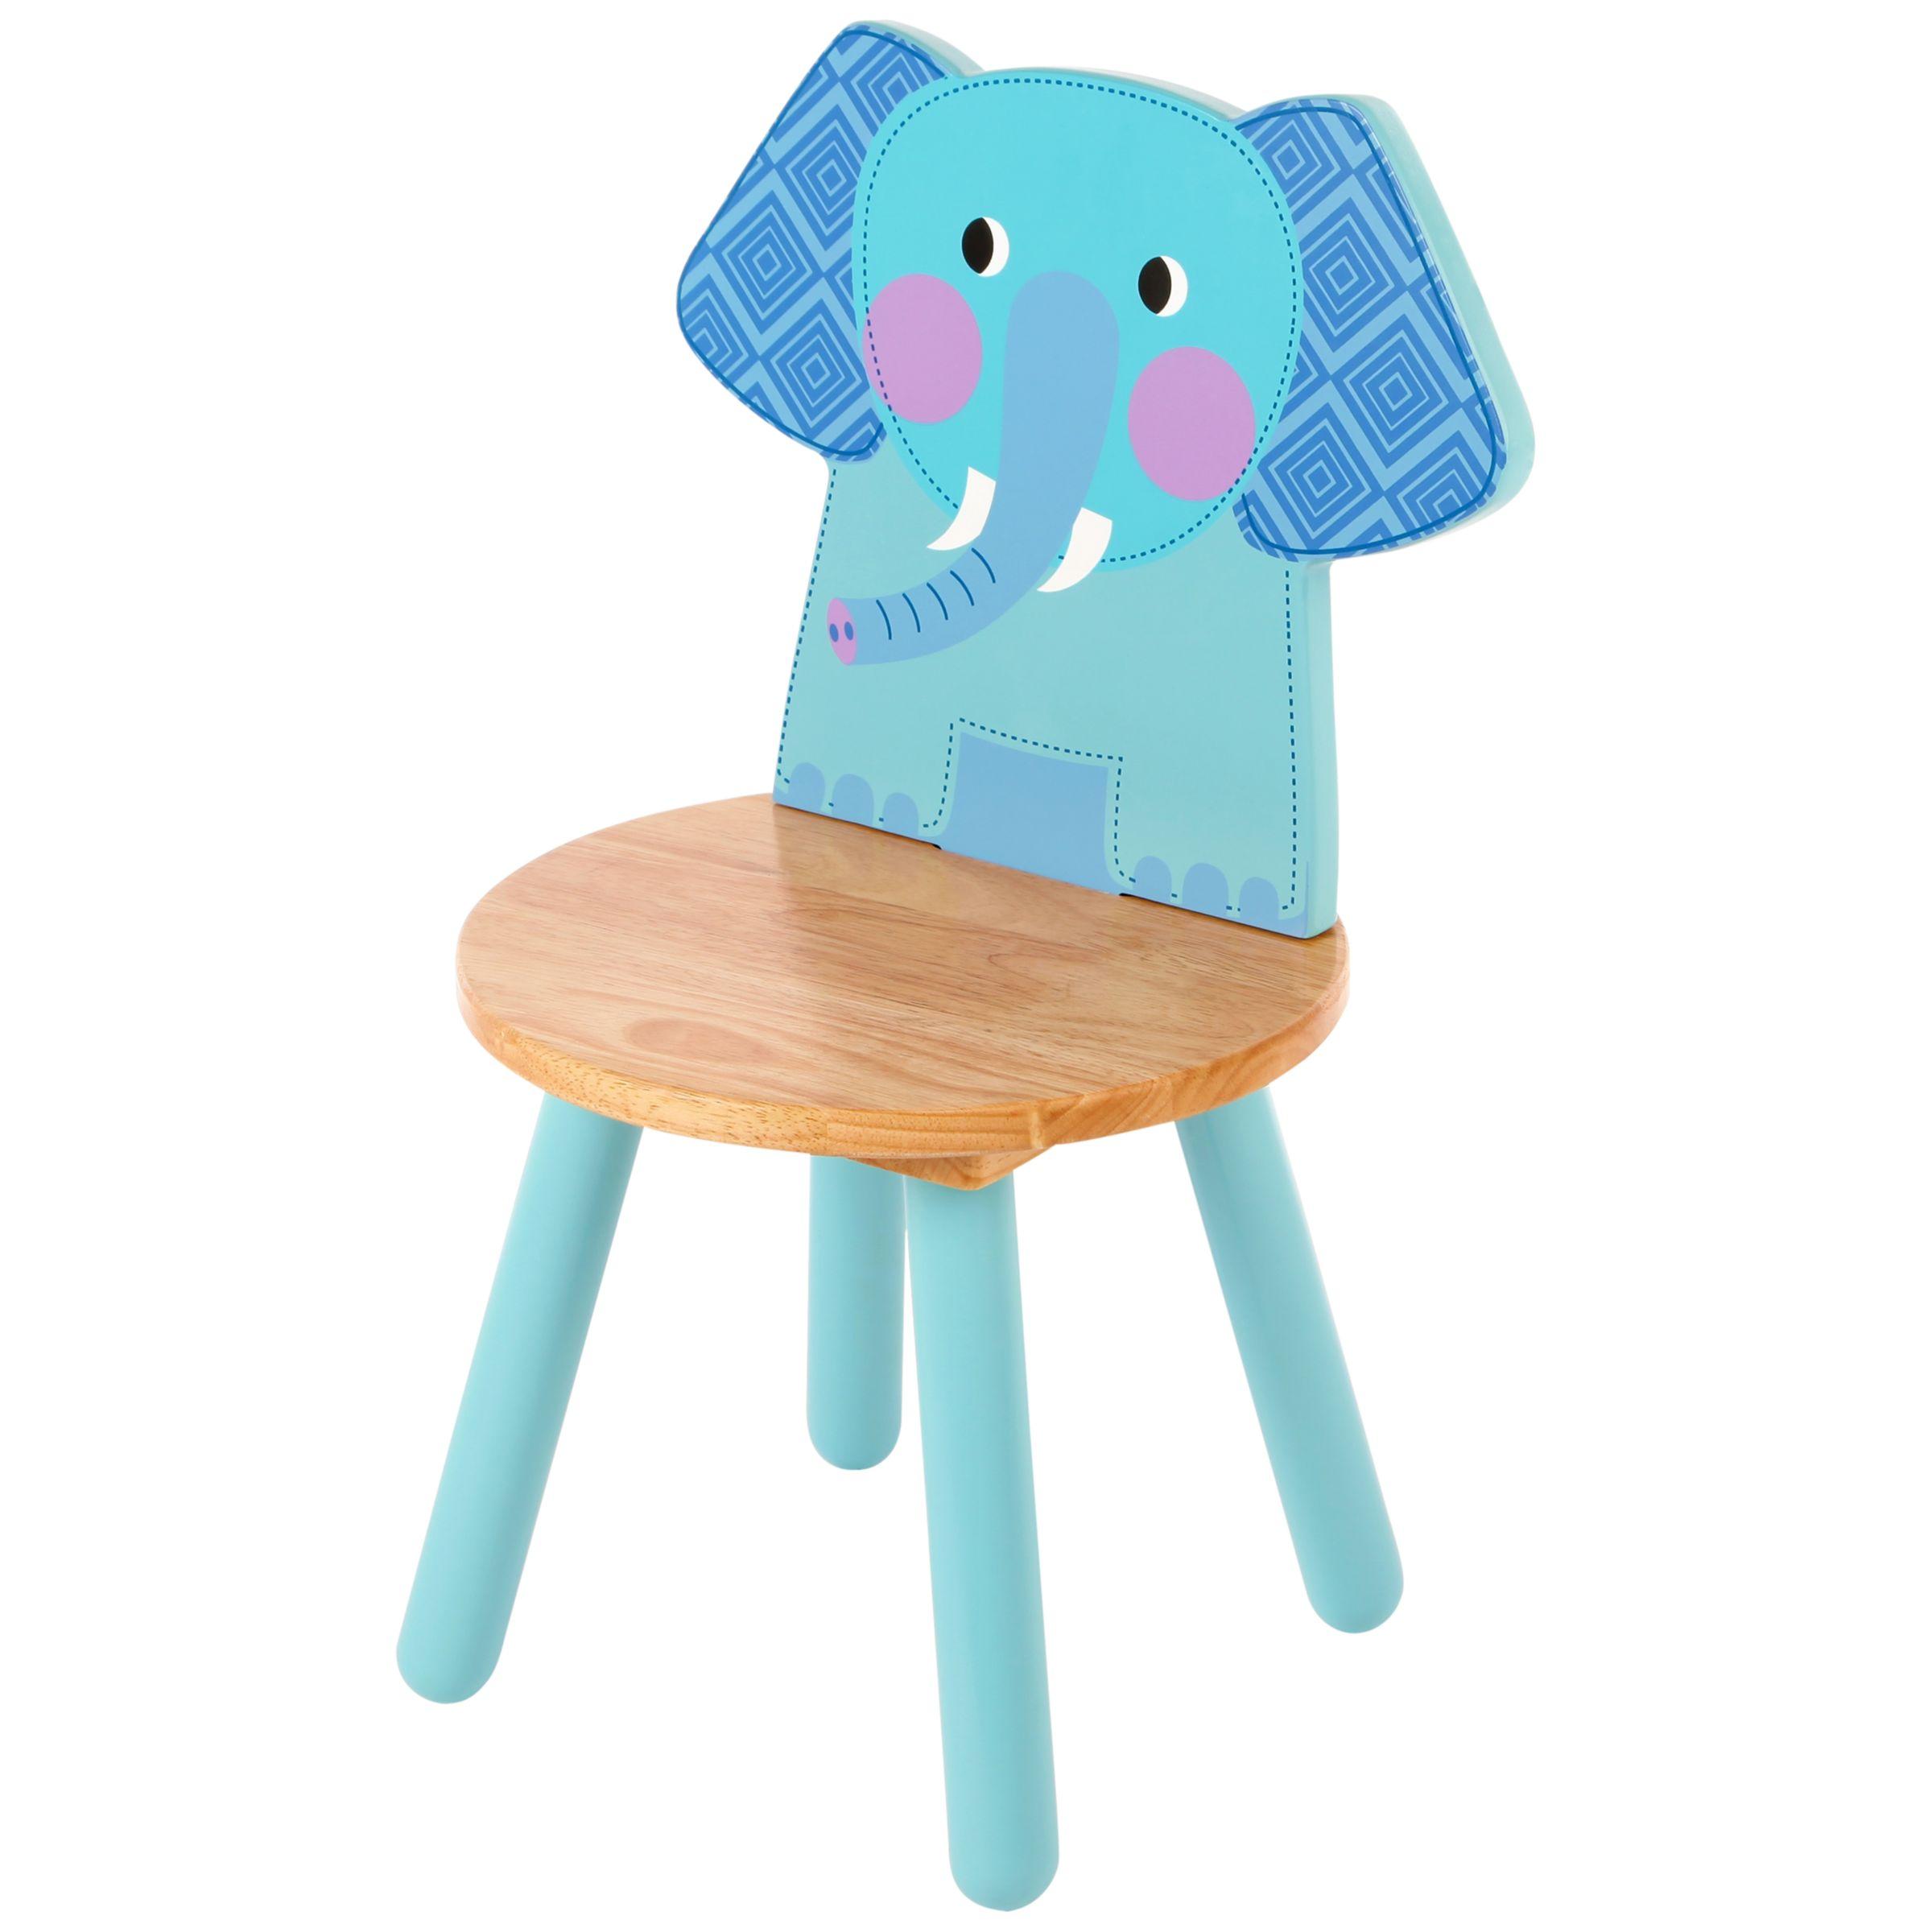 Tidlo Tidlo Chair, Elephant